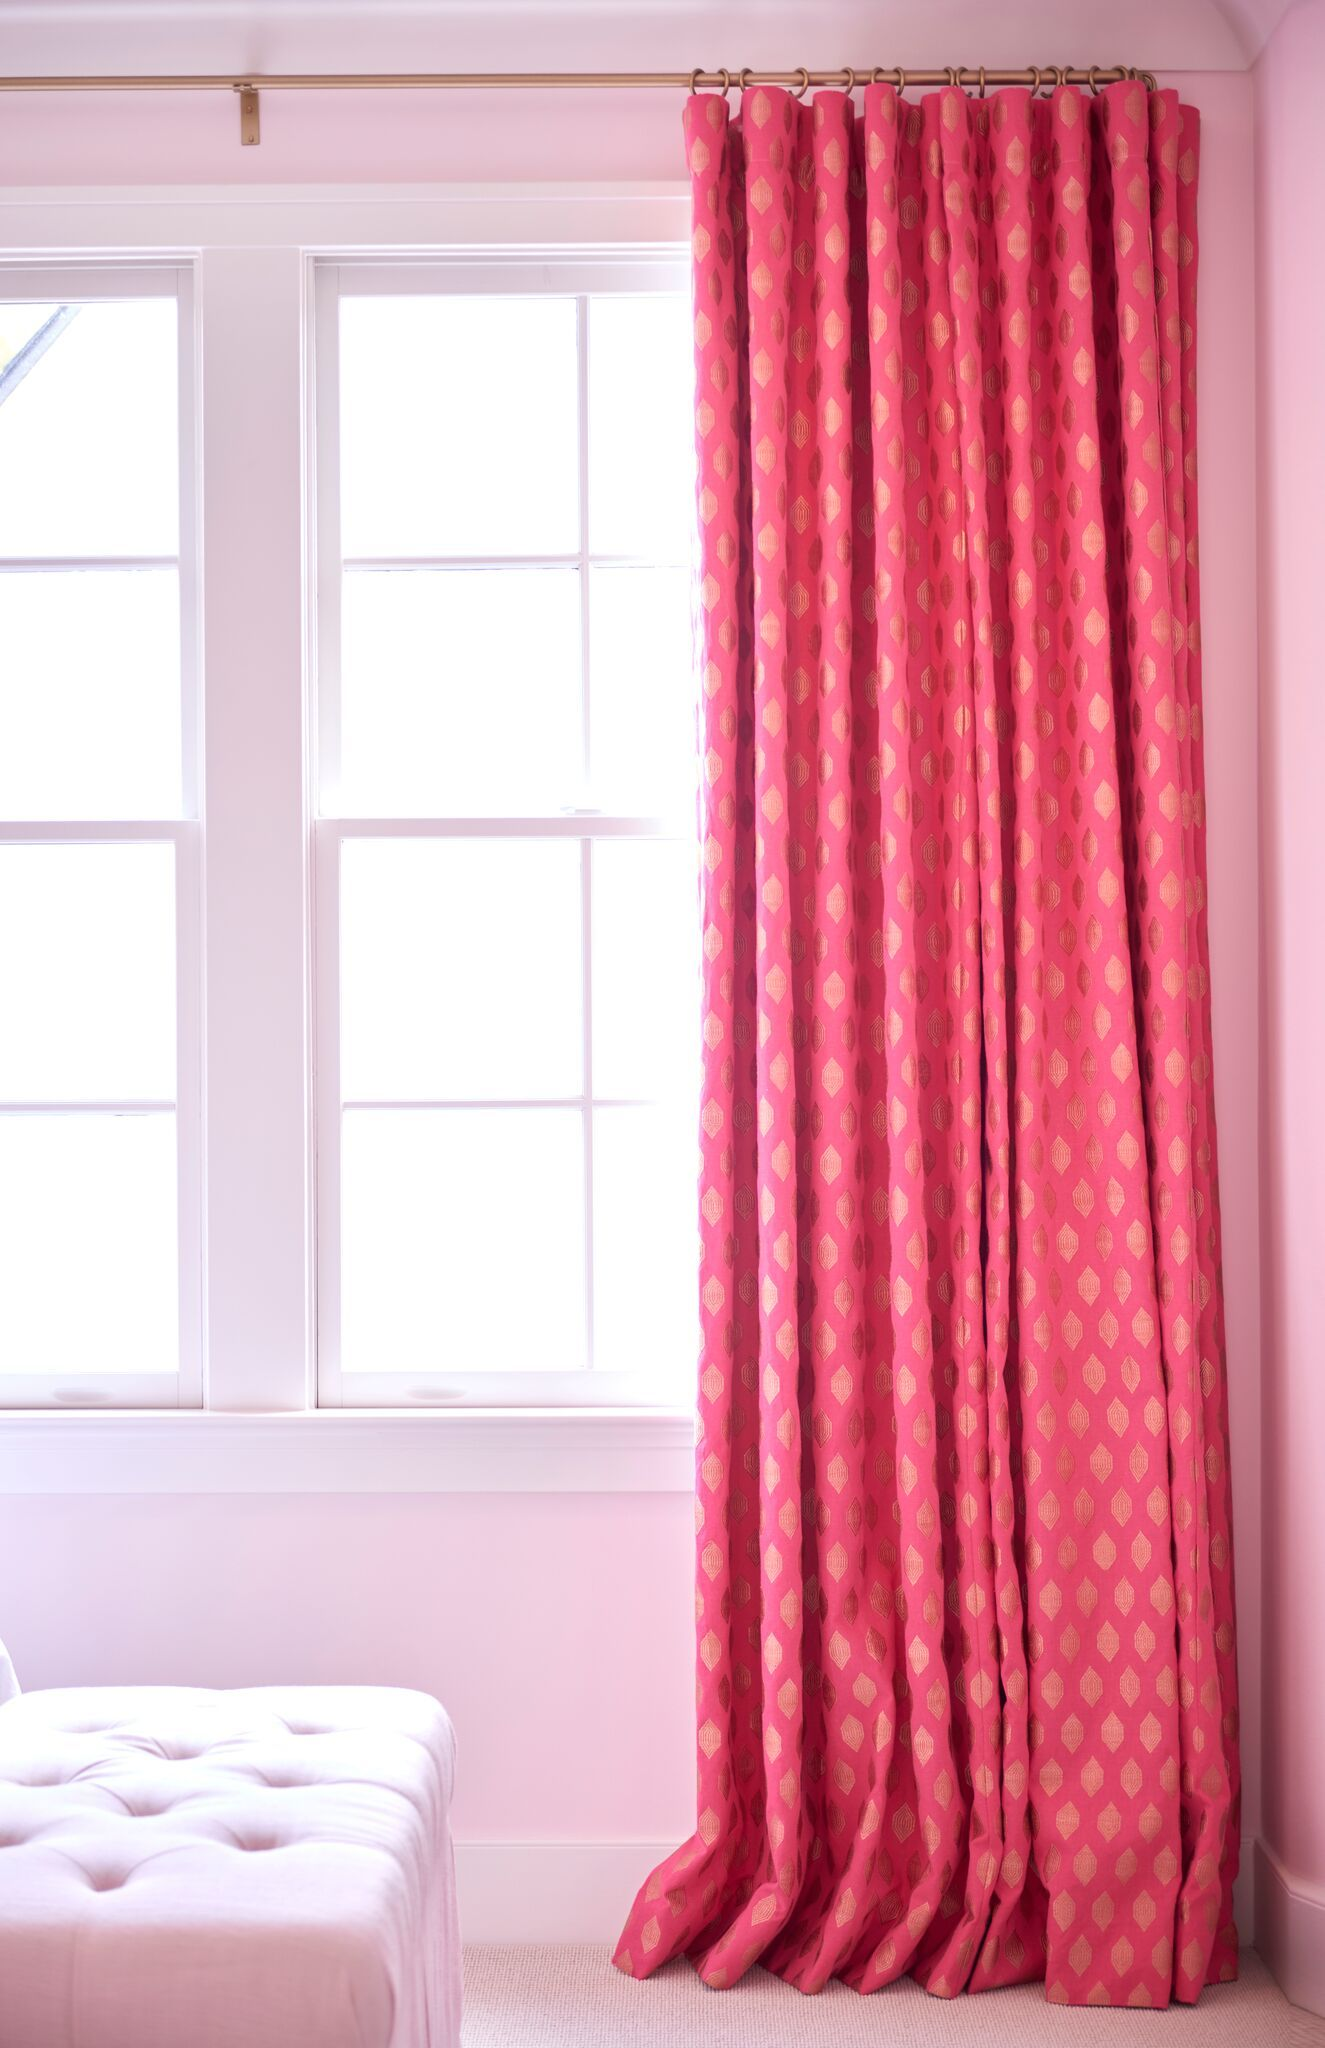 Custom Pink Patterned Drapes Ripplefold Draperies Pink Decor